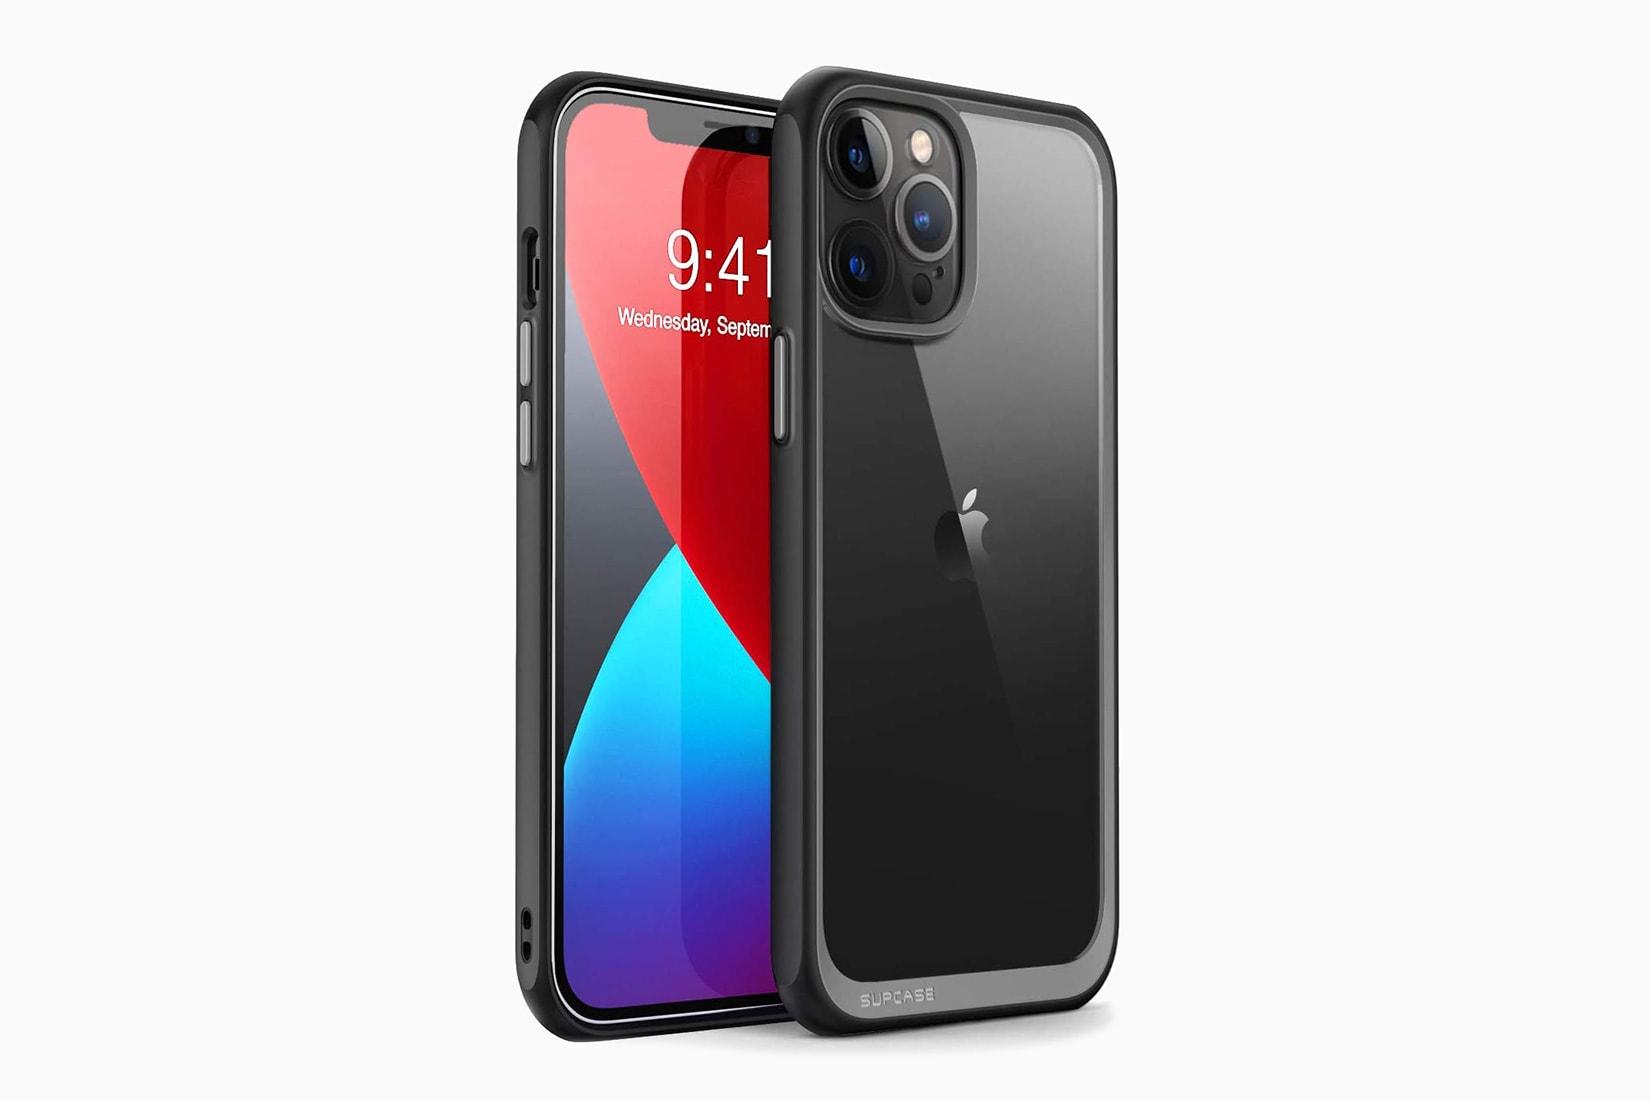 best iphone case lightweight supcase unicorn beetle - Luxe Digital